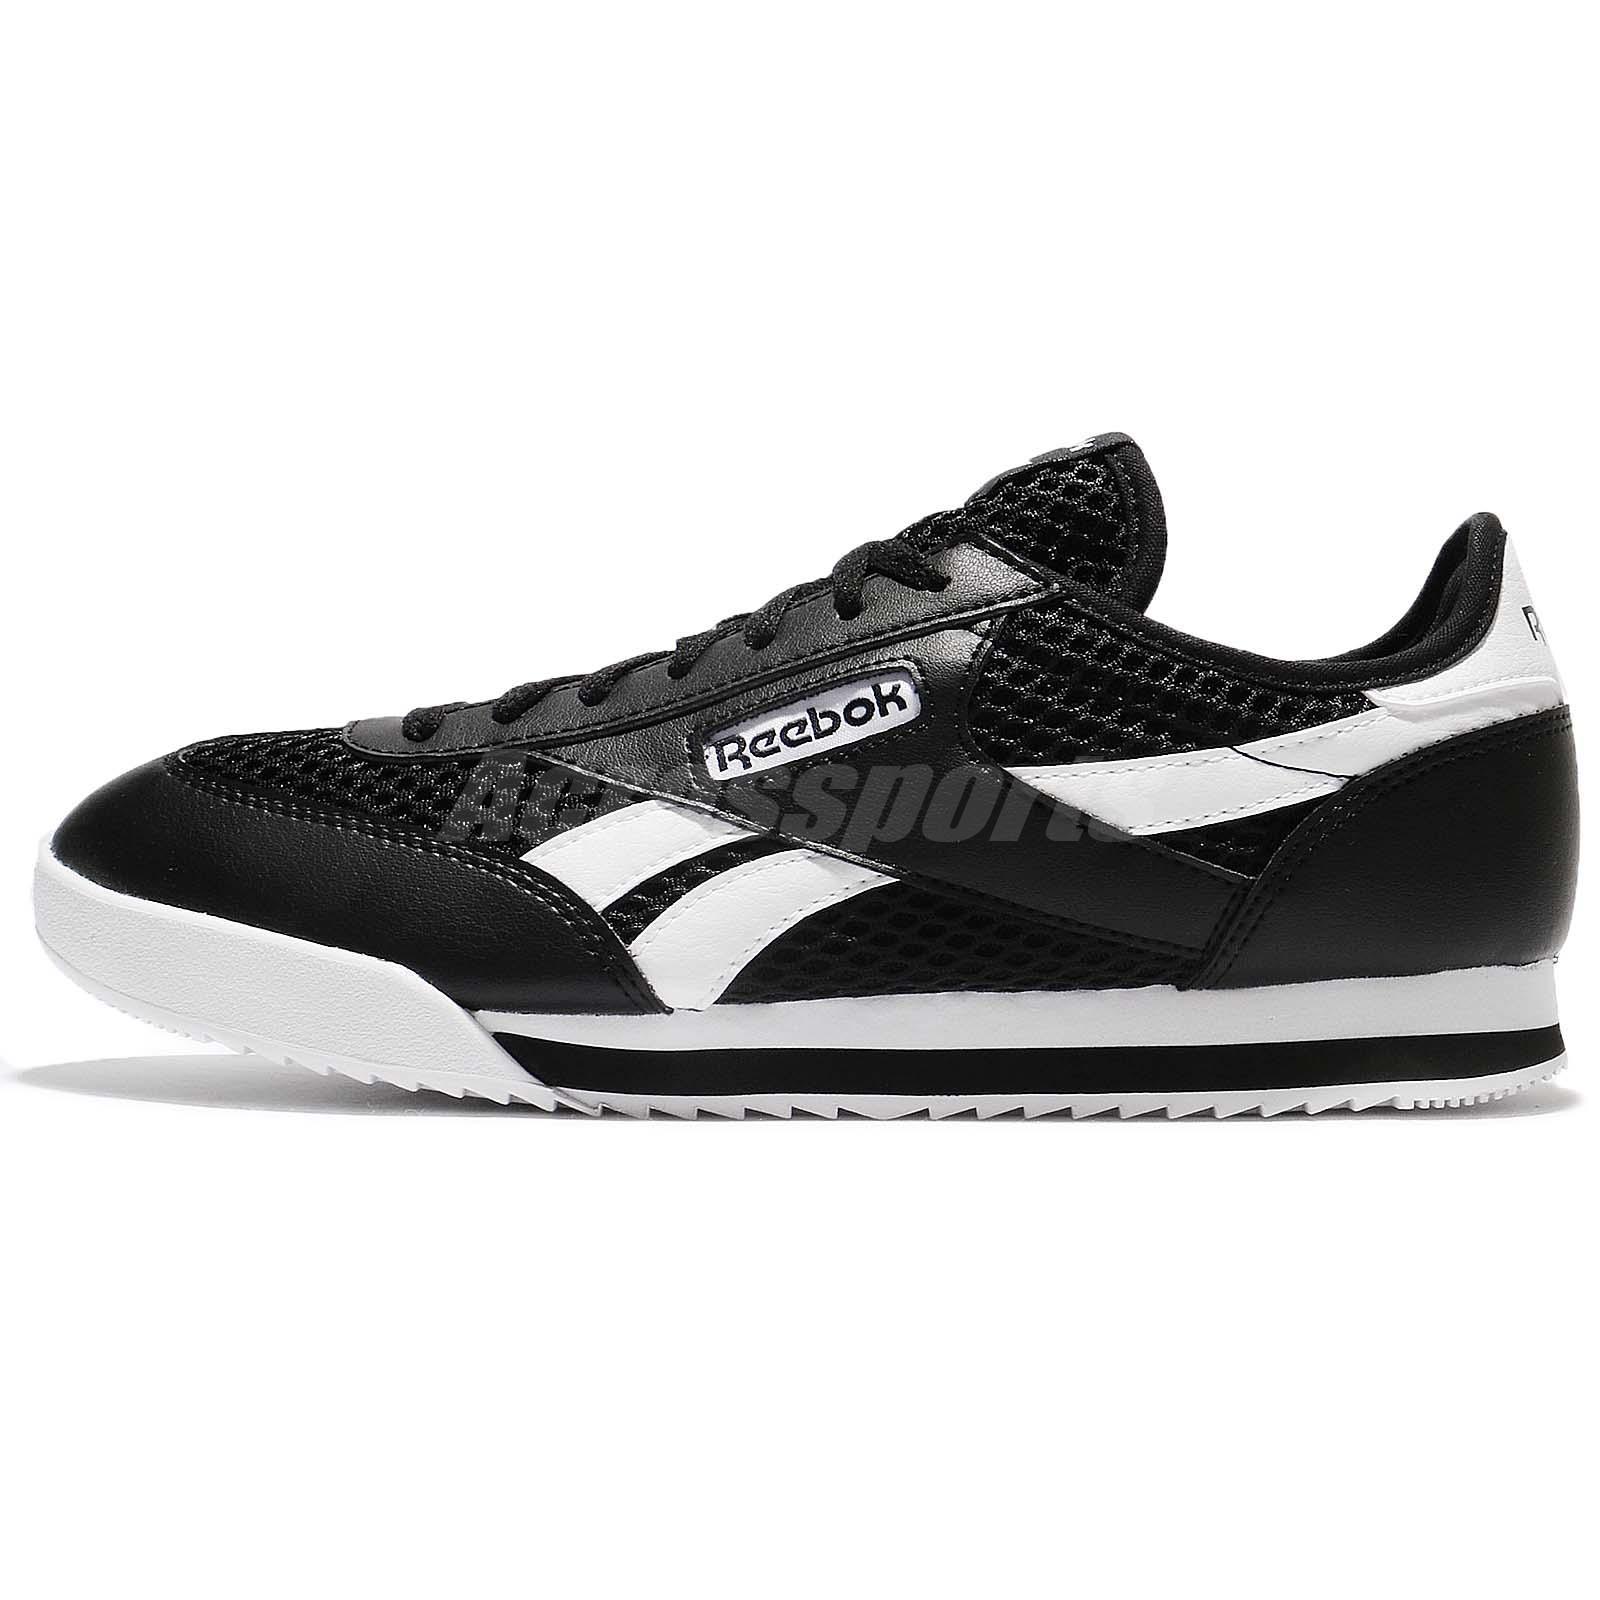 Shoes Détails Bd3300 Black Leather Sneakers Running Royal Sur Reebok 2txt White Men Rayen PwOX80kn